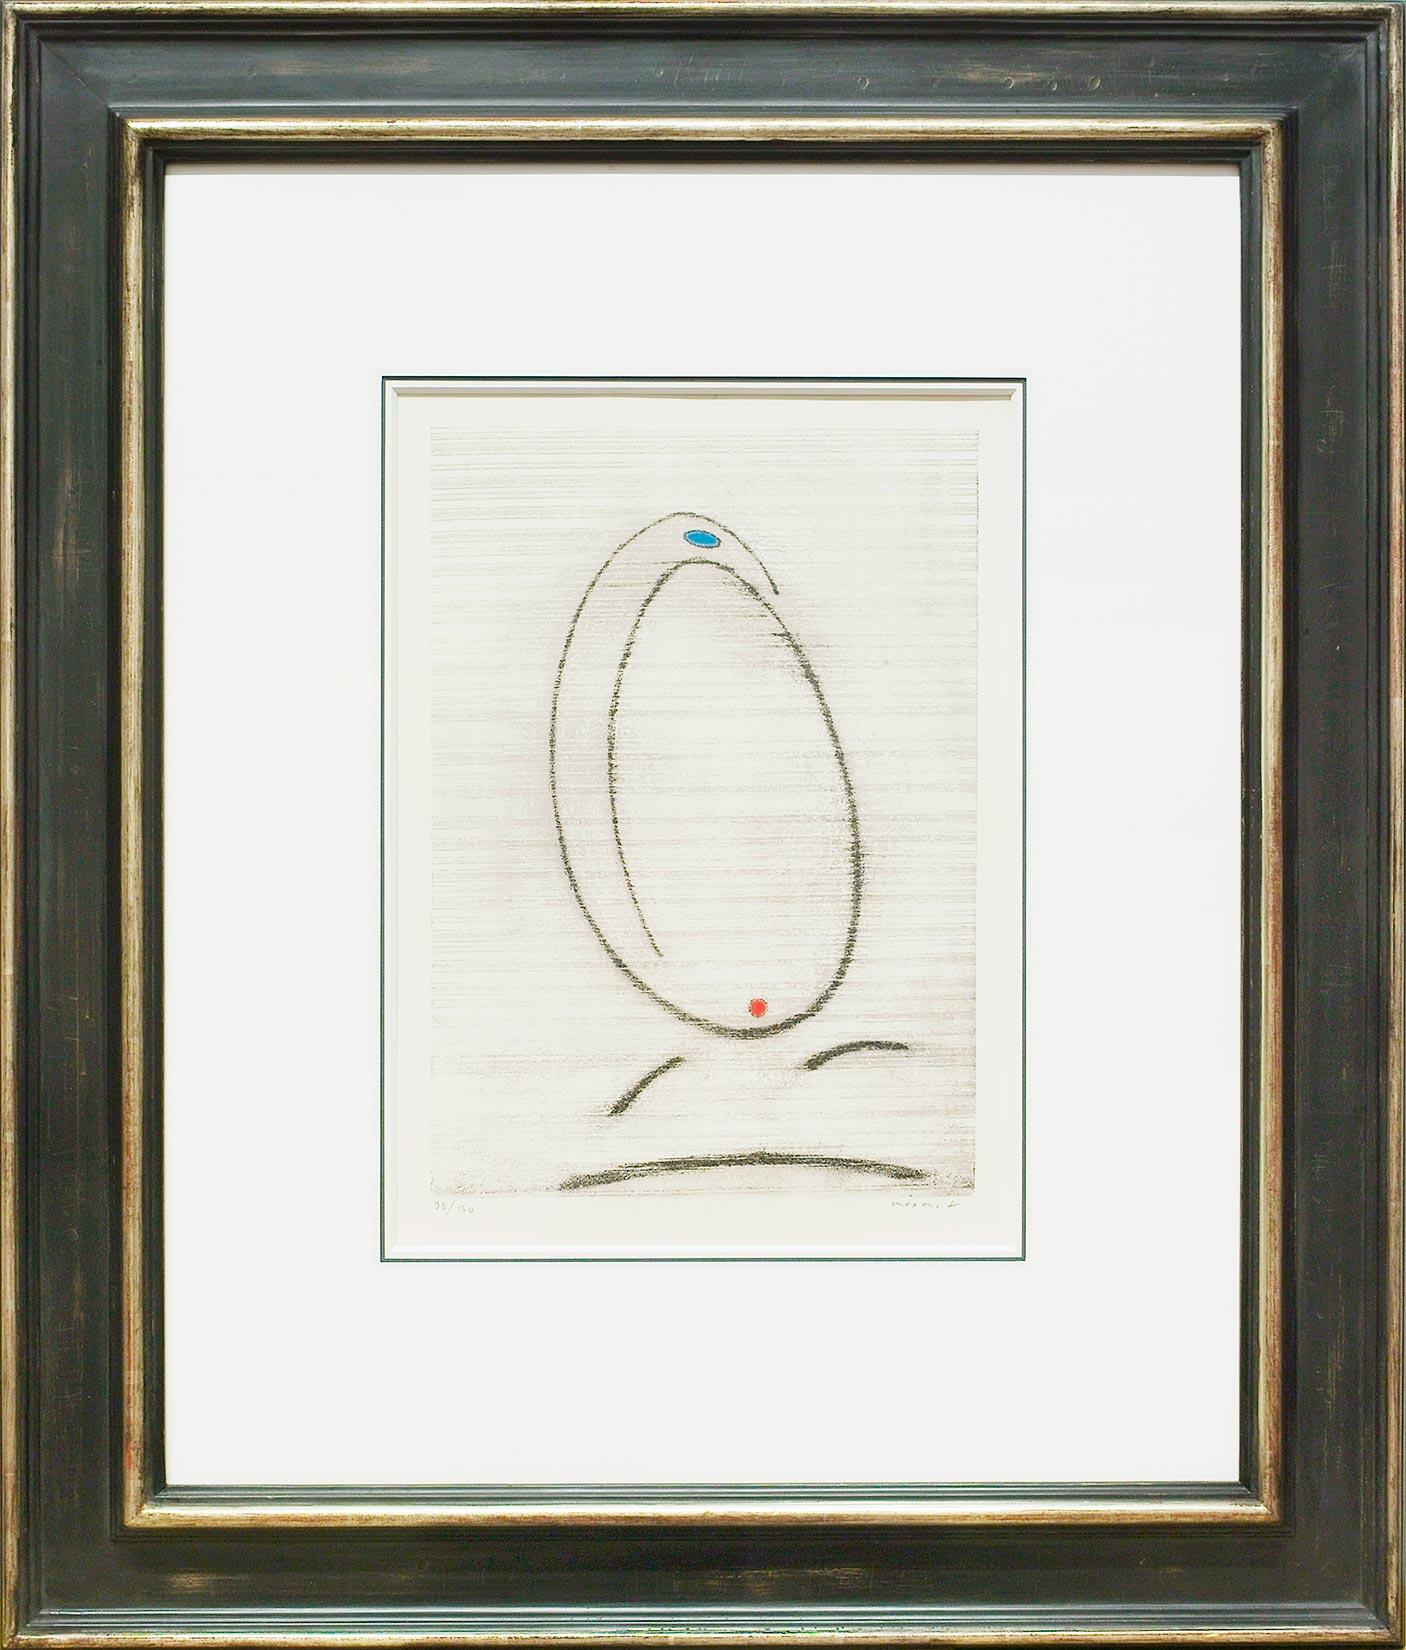 Max Ernst «L'oiseau caramel II» Galerie Française